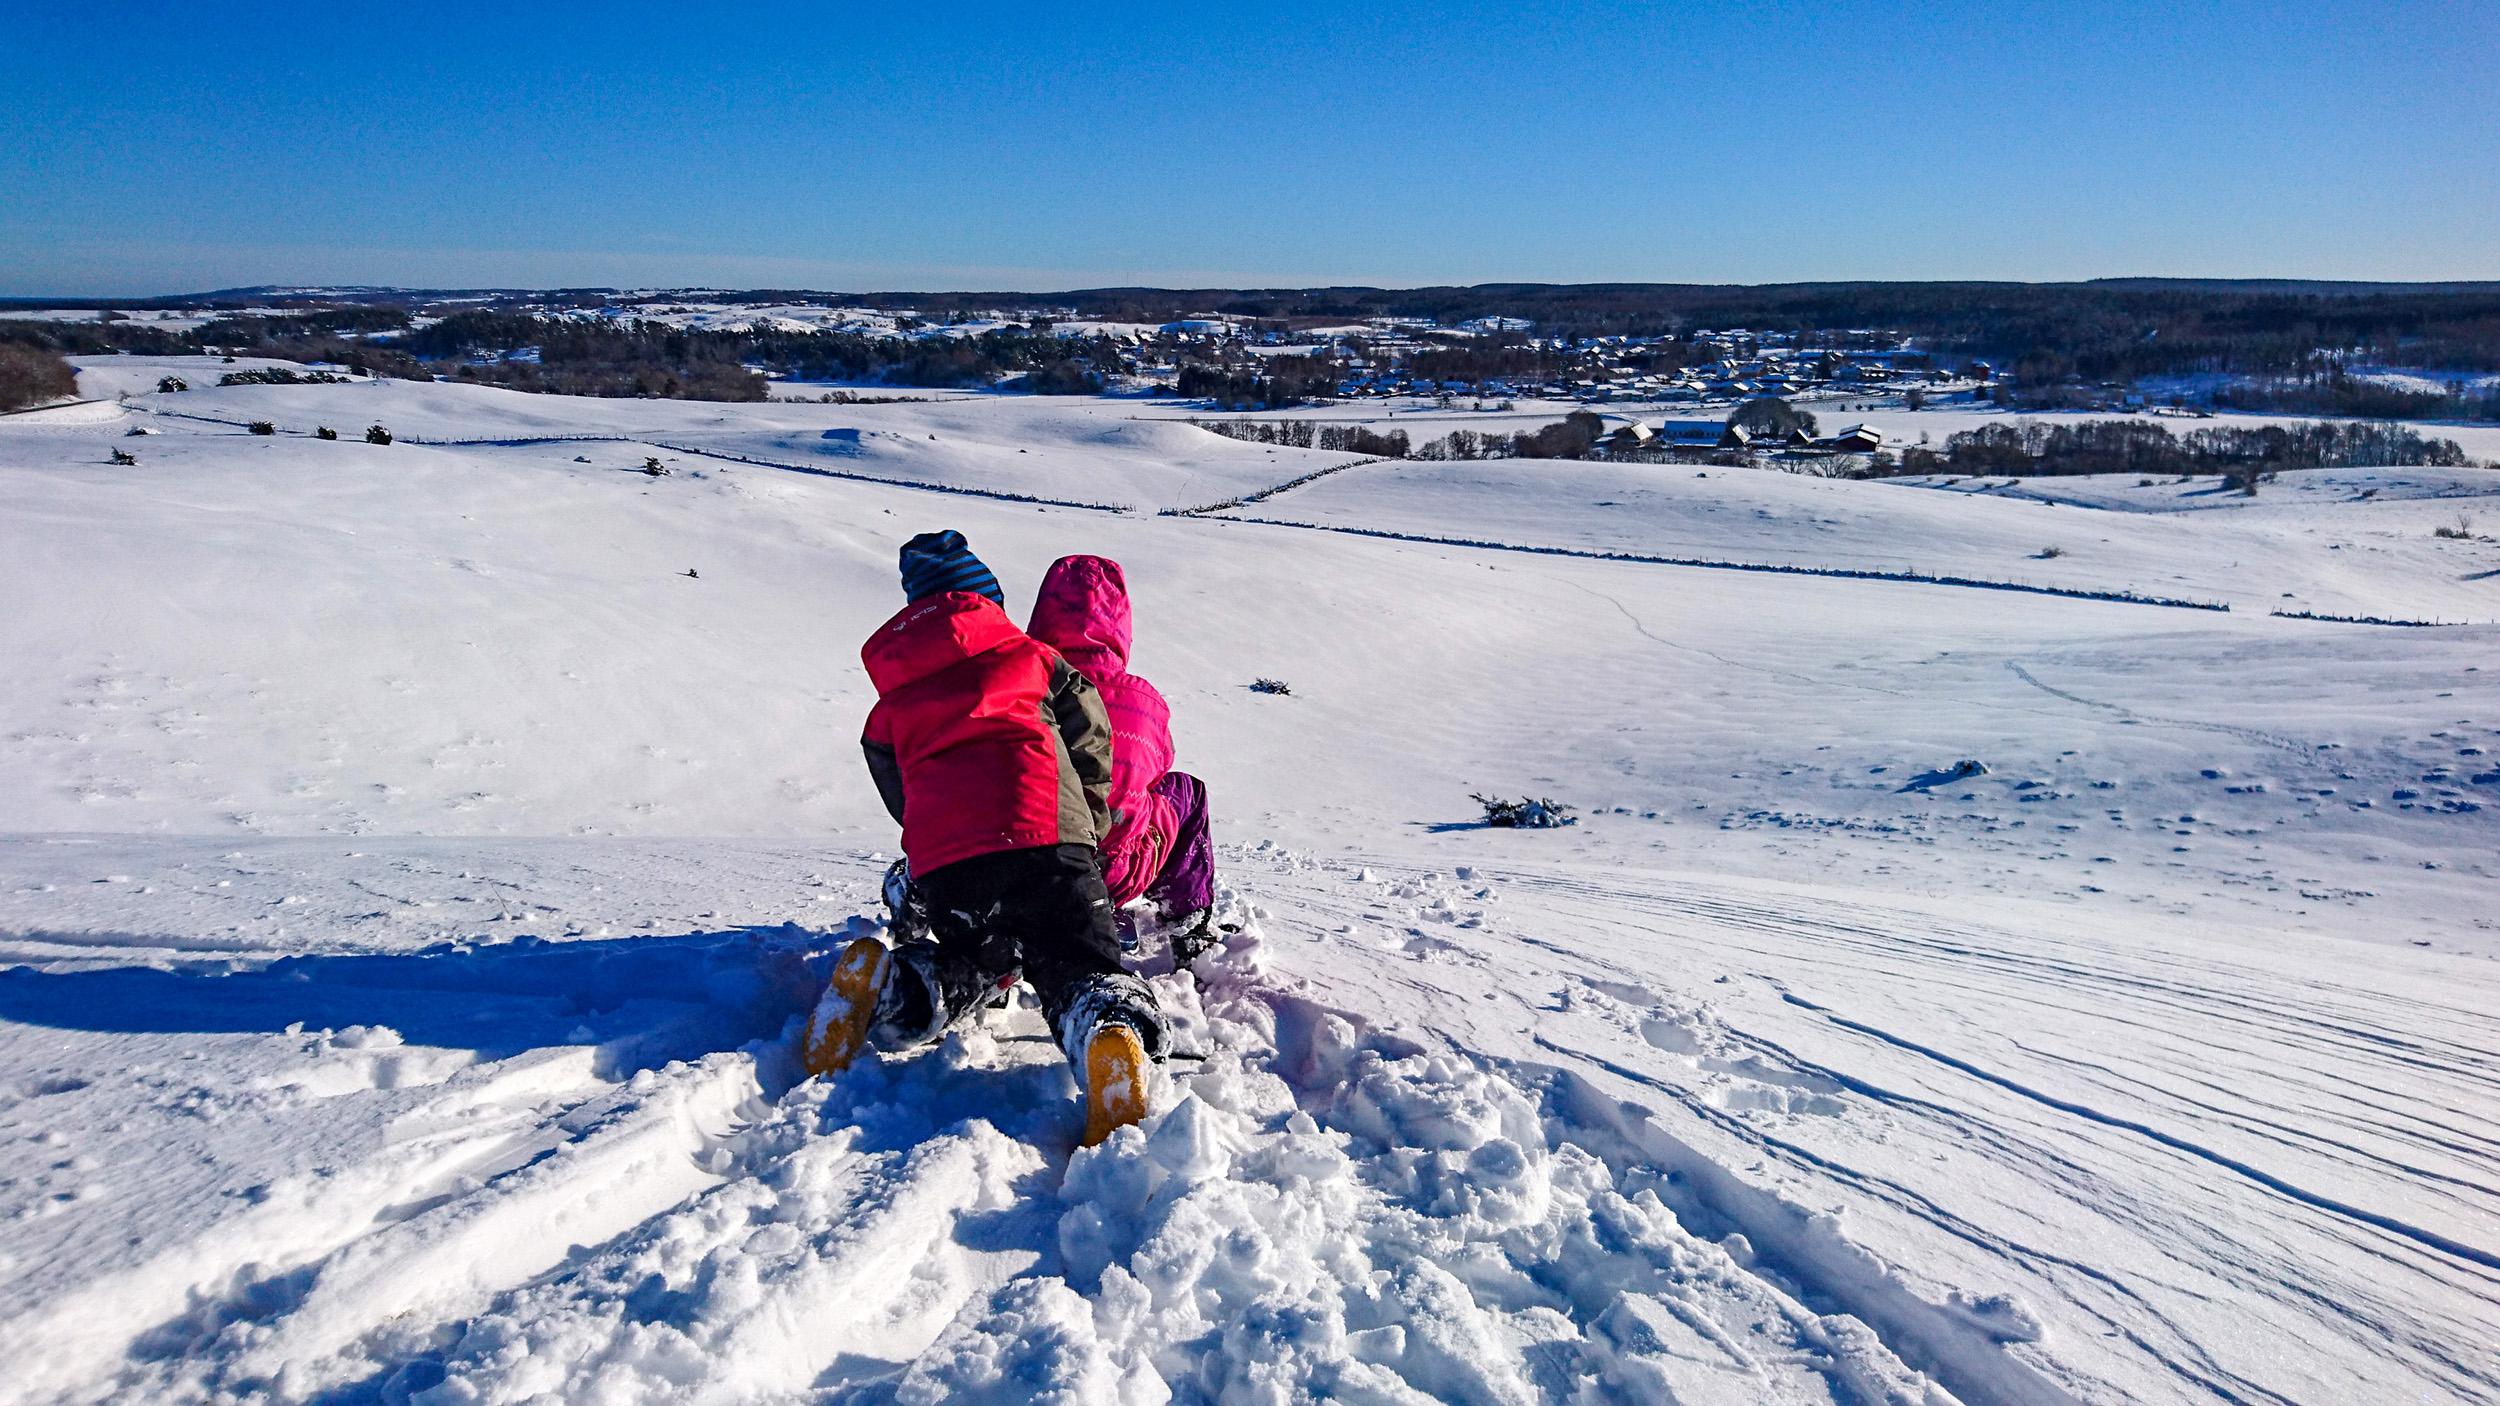 Det blir dubbelt så kul med två på snowracern i Brösarps norra backar.